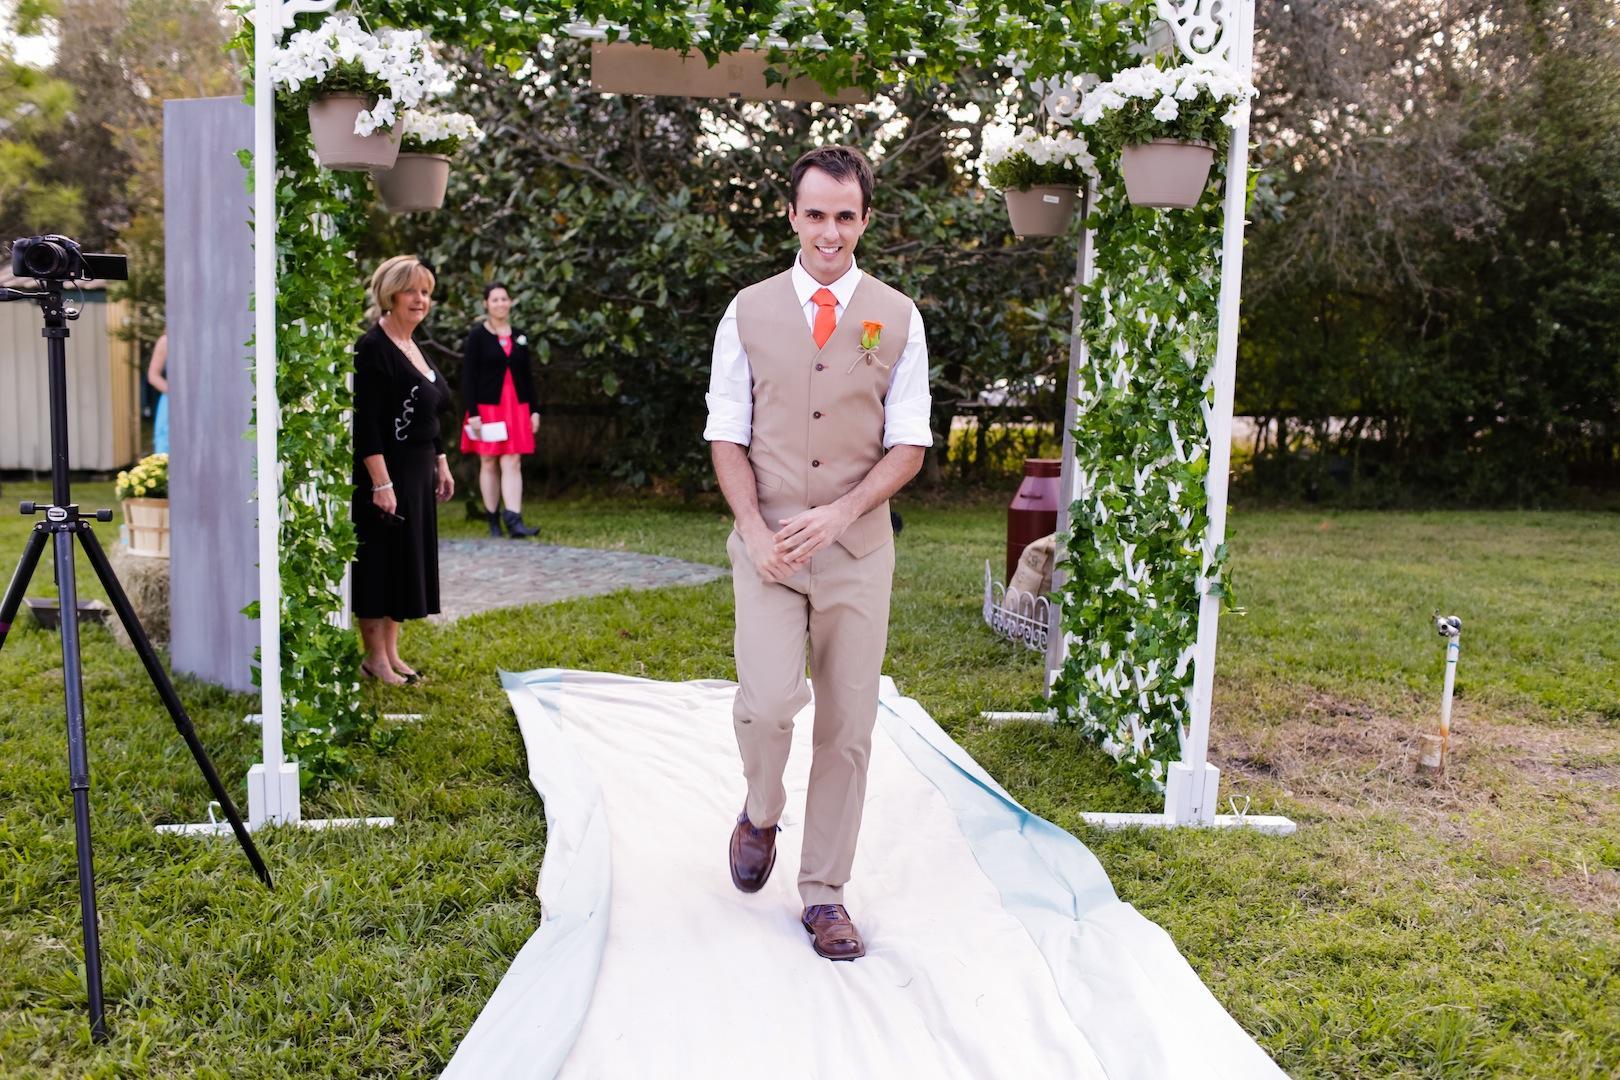 _Lotus Eyes Photography. wedding at Florida Ecosafari